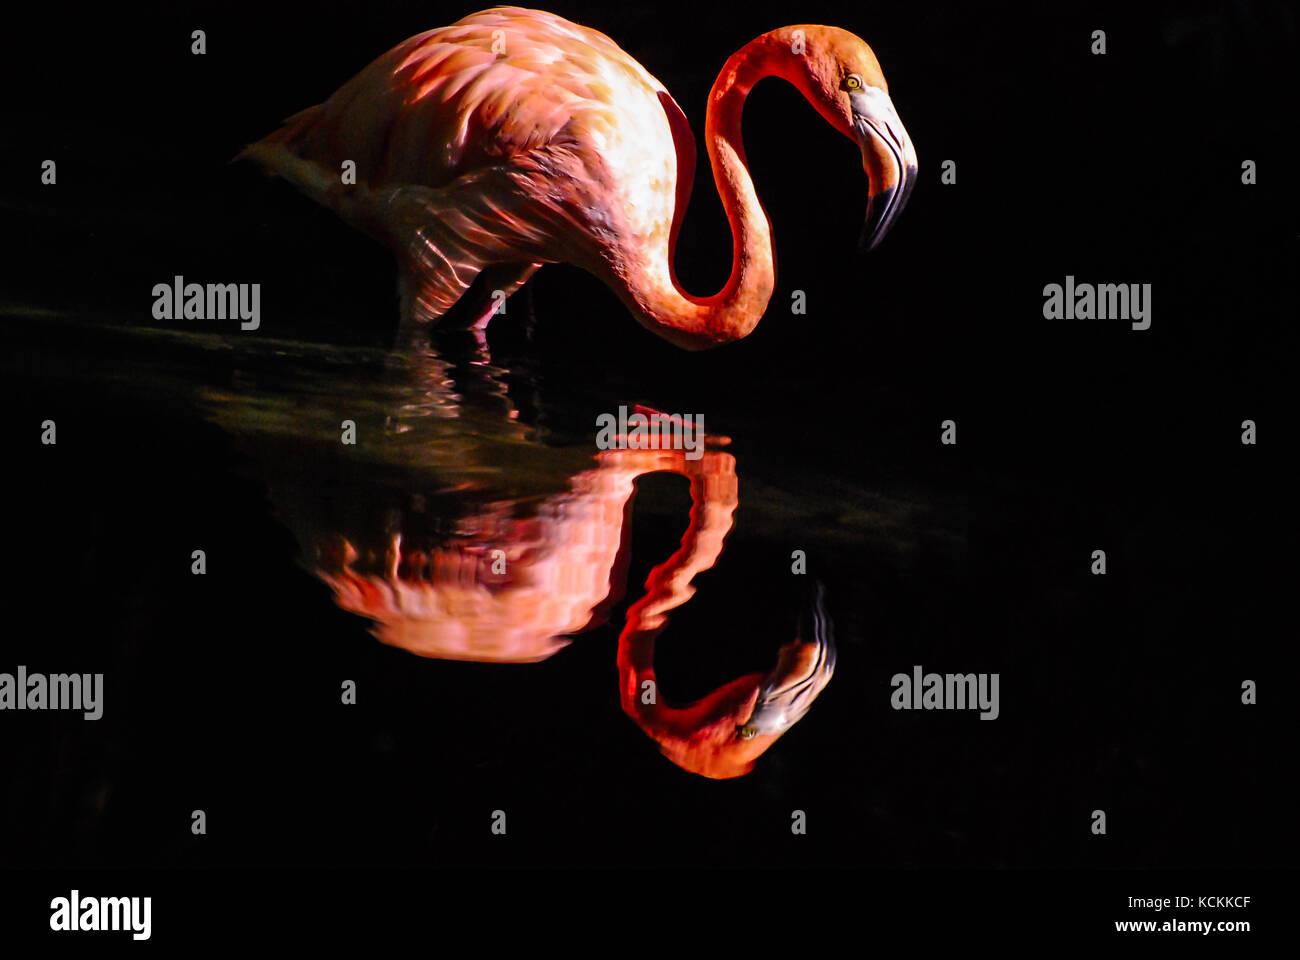 Pink flamingo reflected in water. Dark background - Stock Image